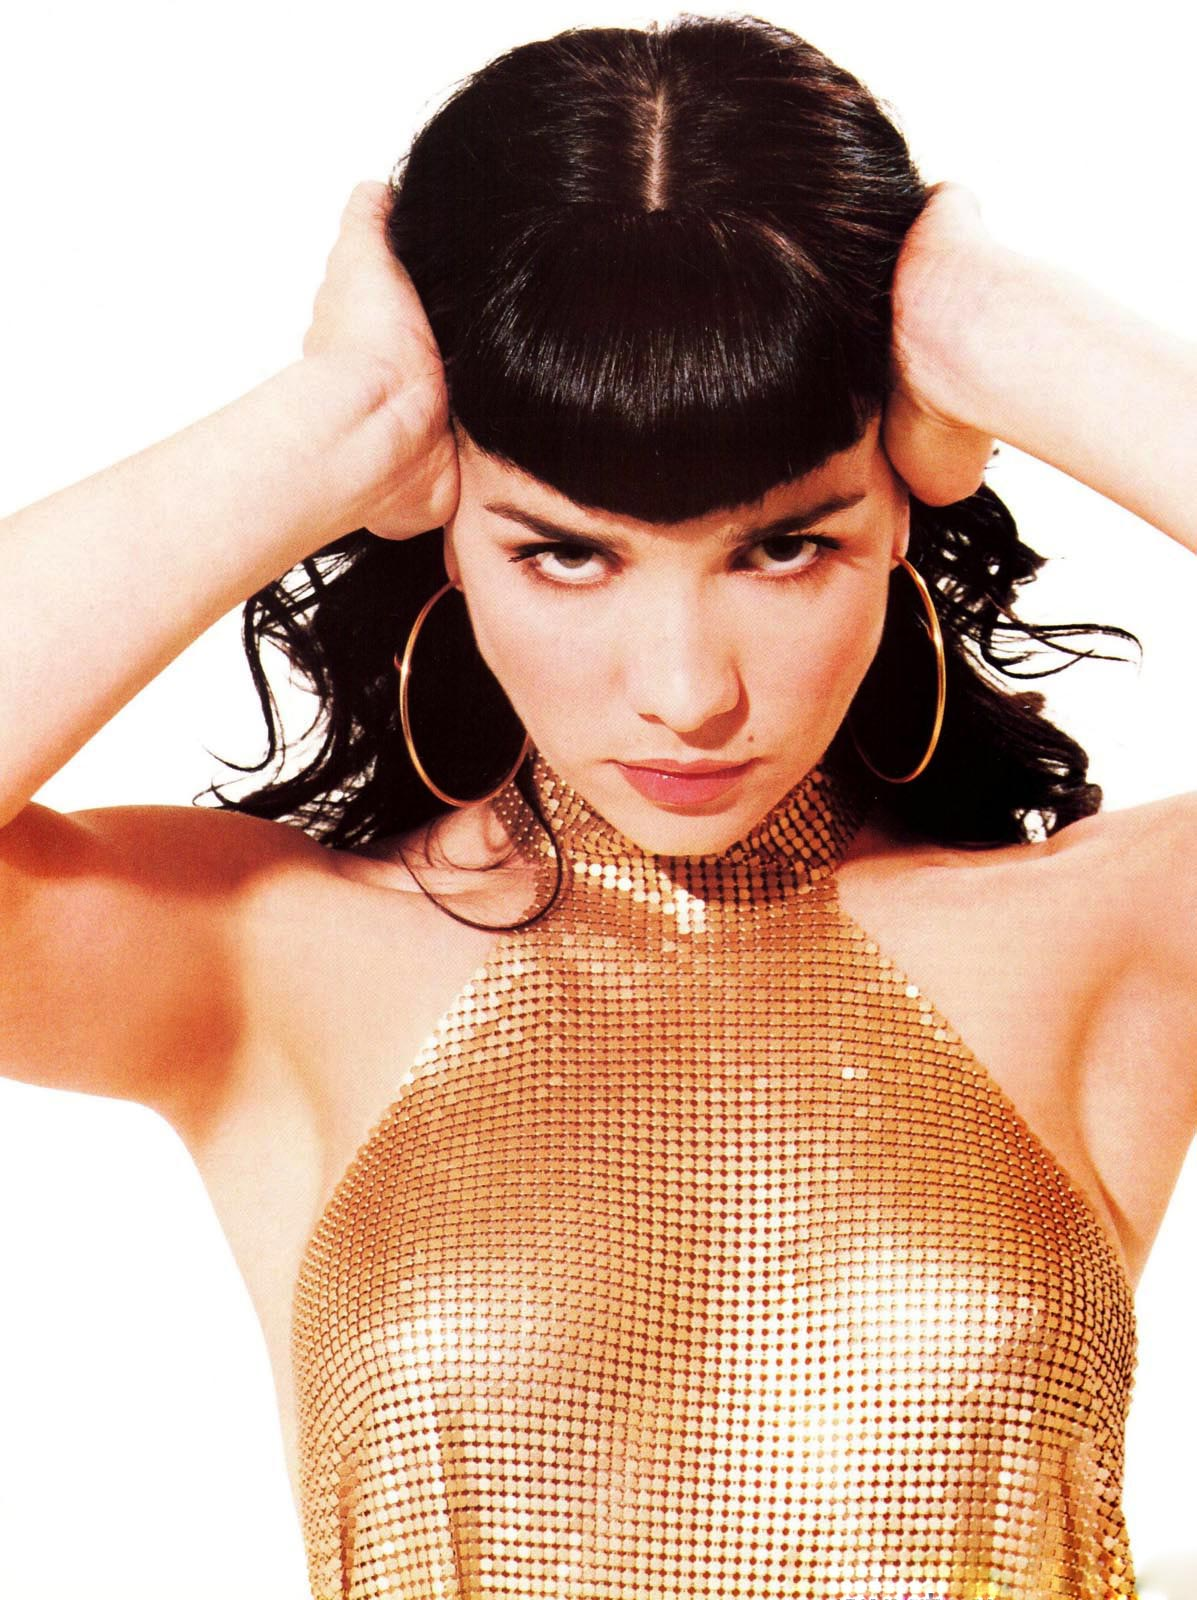 BestNudeCelebcom  Nude celebrity porn pictures and videos